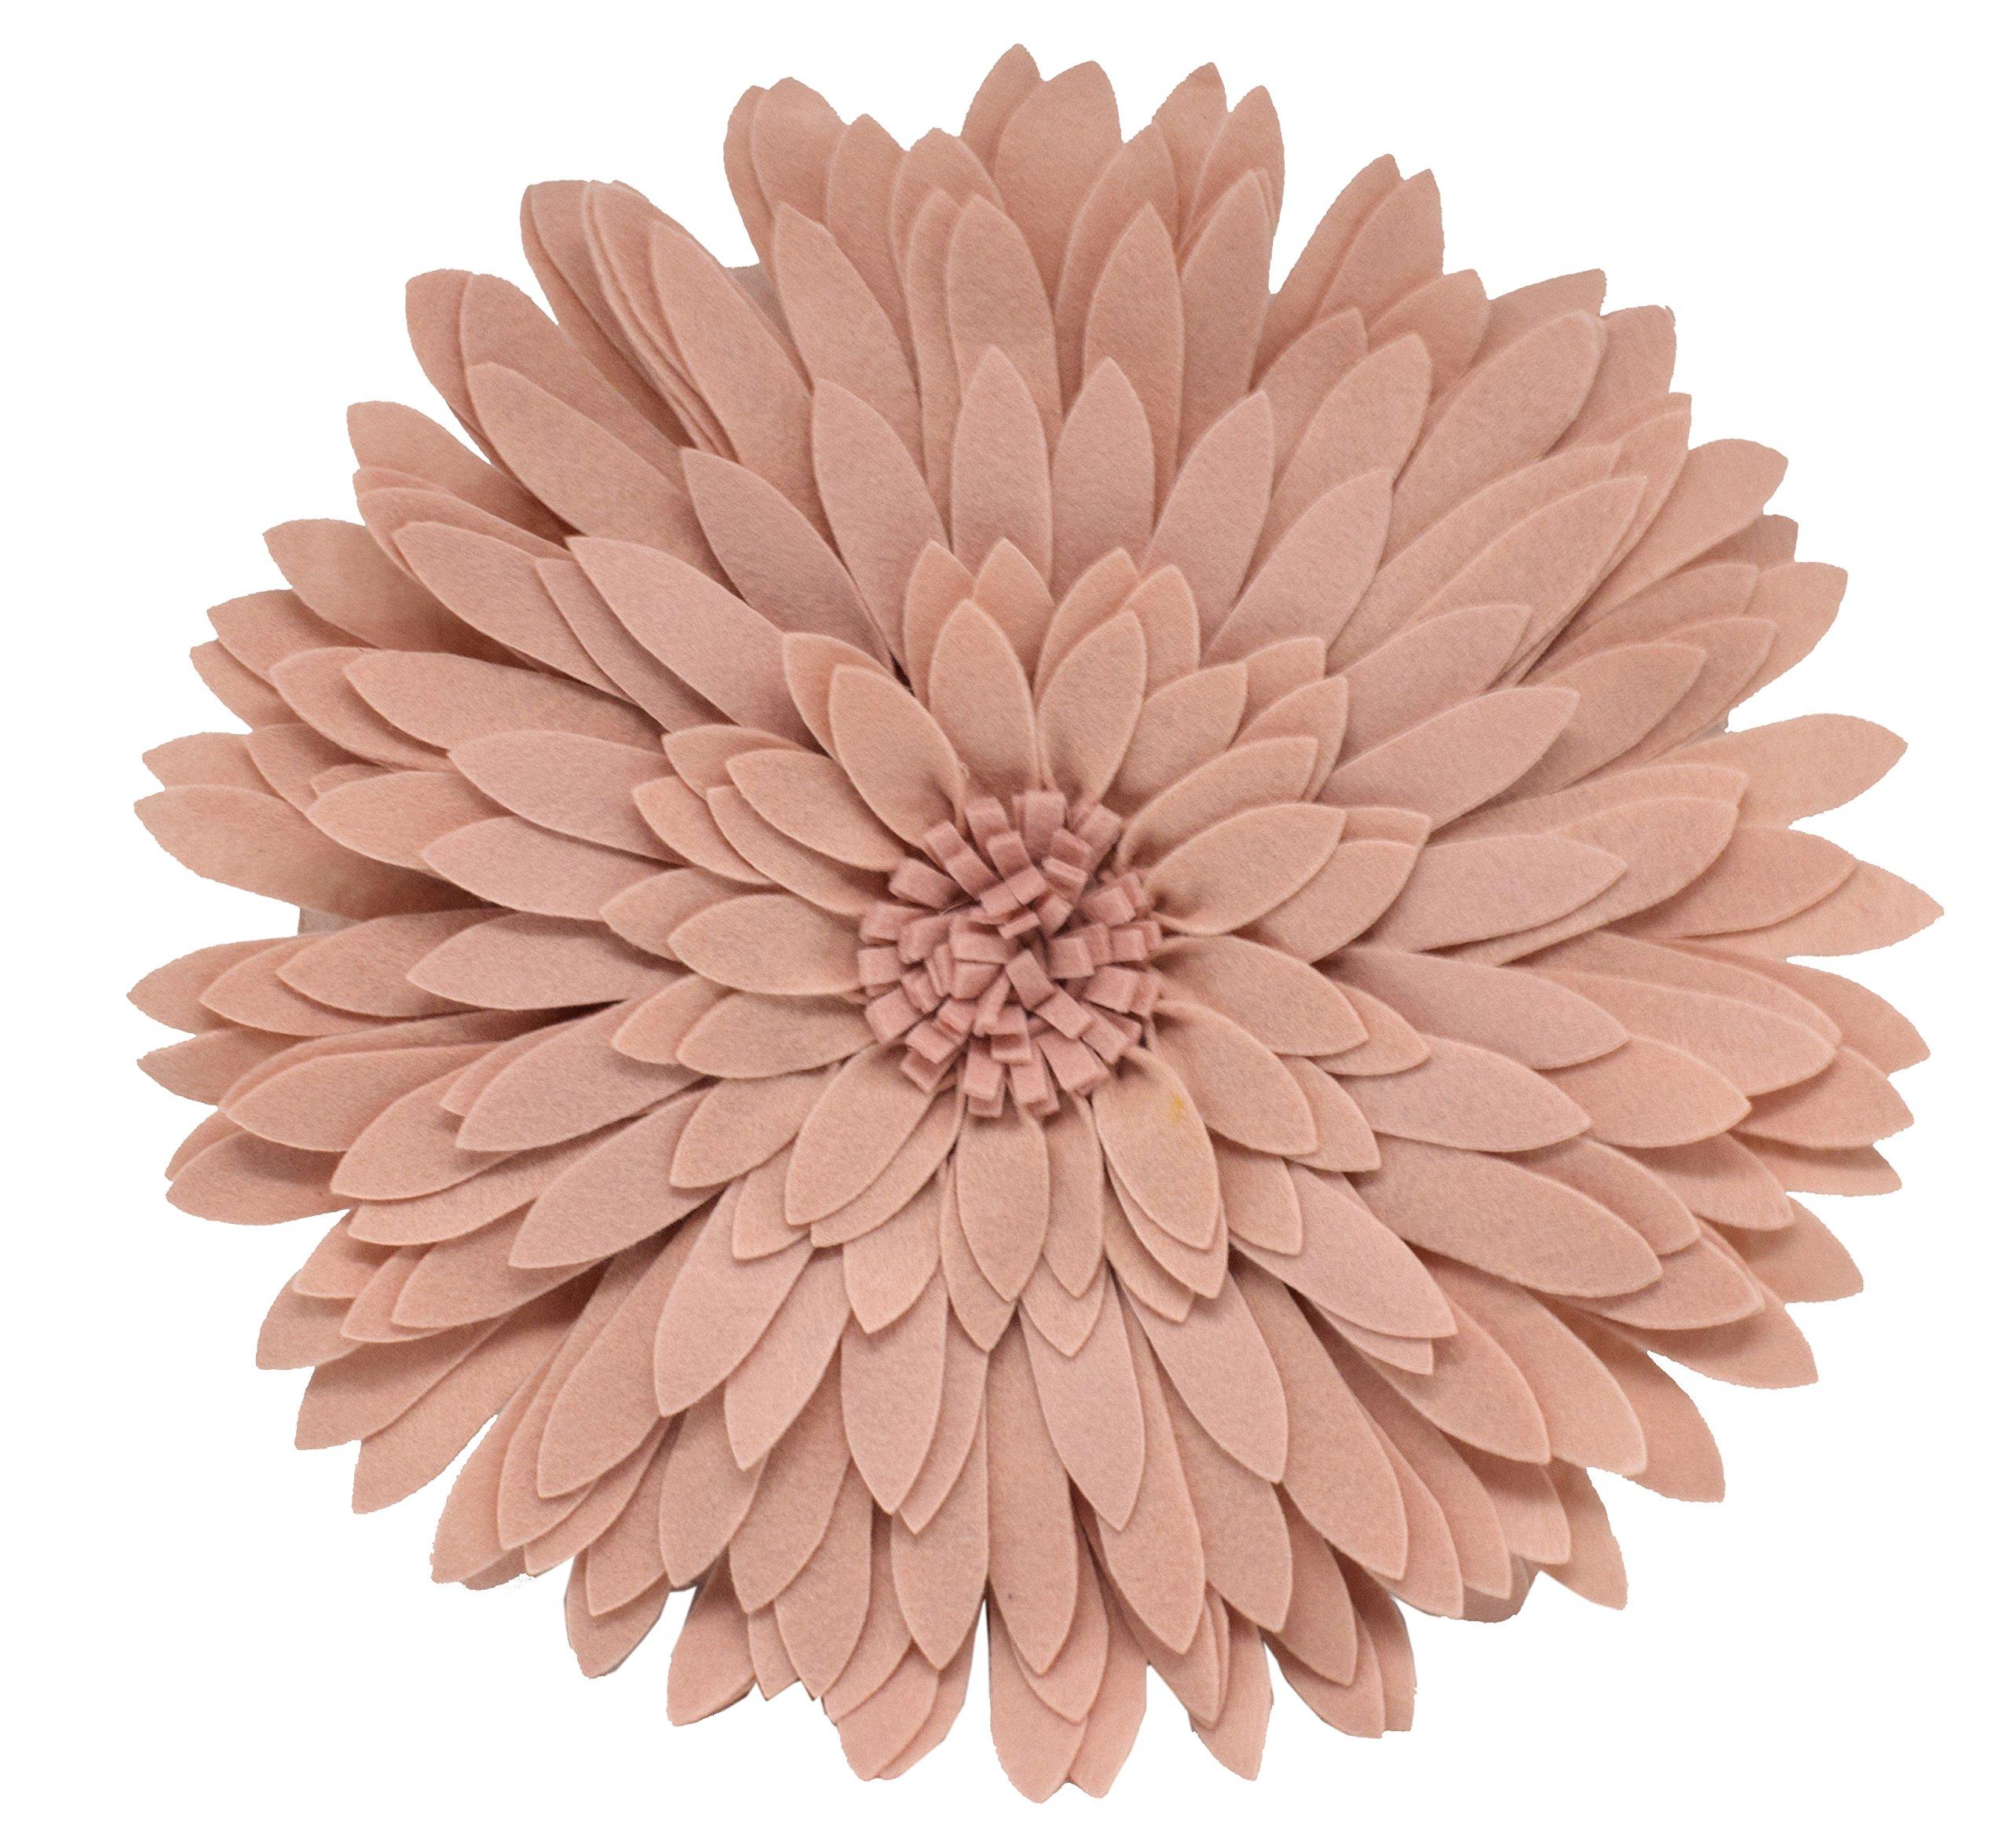 Fennco Styles 3D Sunflower Decorative Throw Pillow 13'' Round (Rose, Case+Insert)